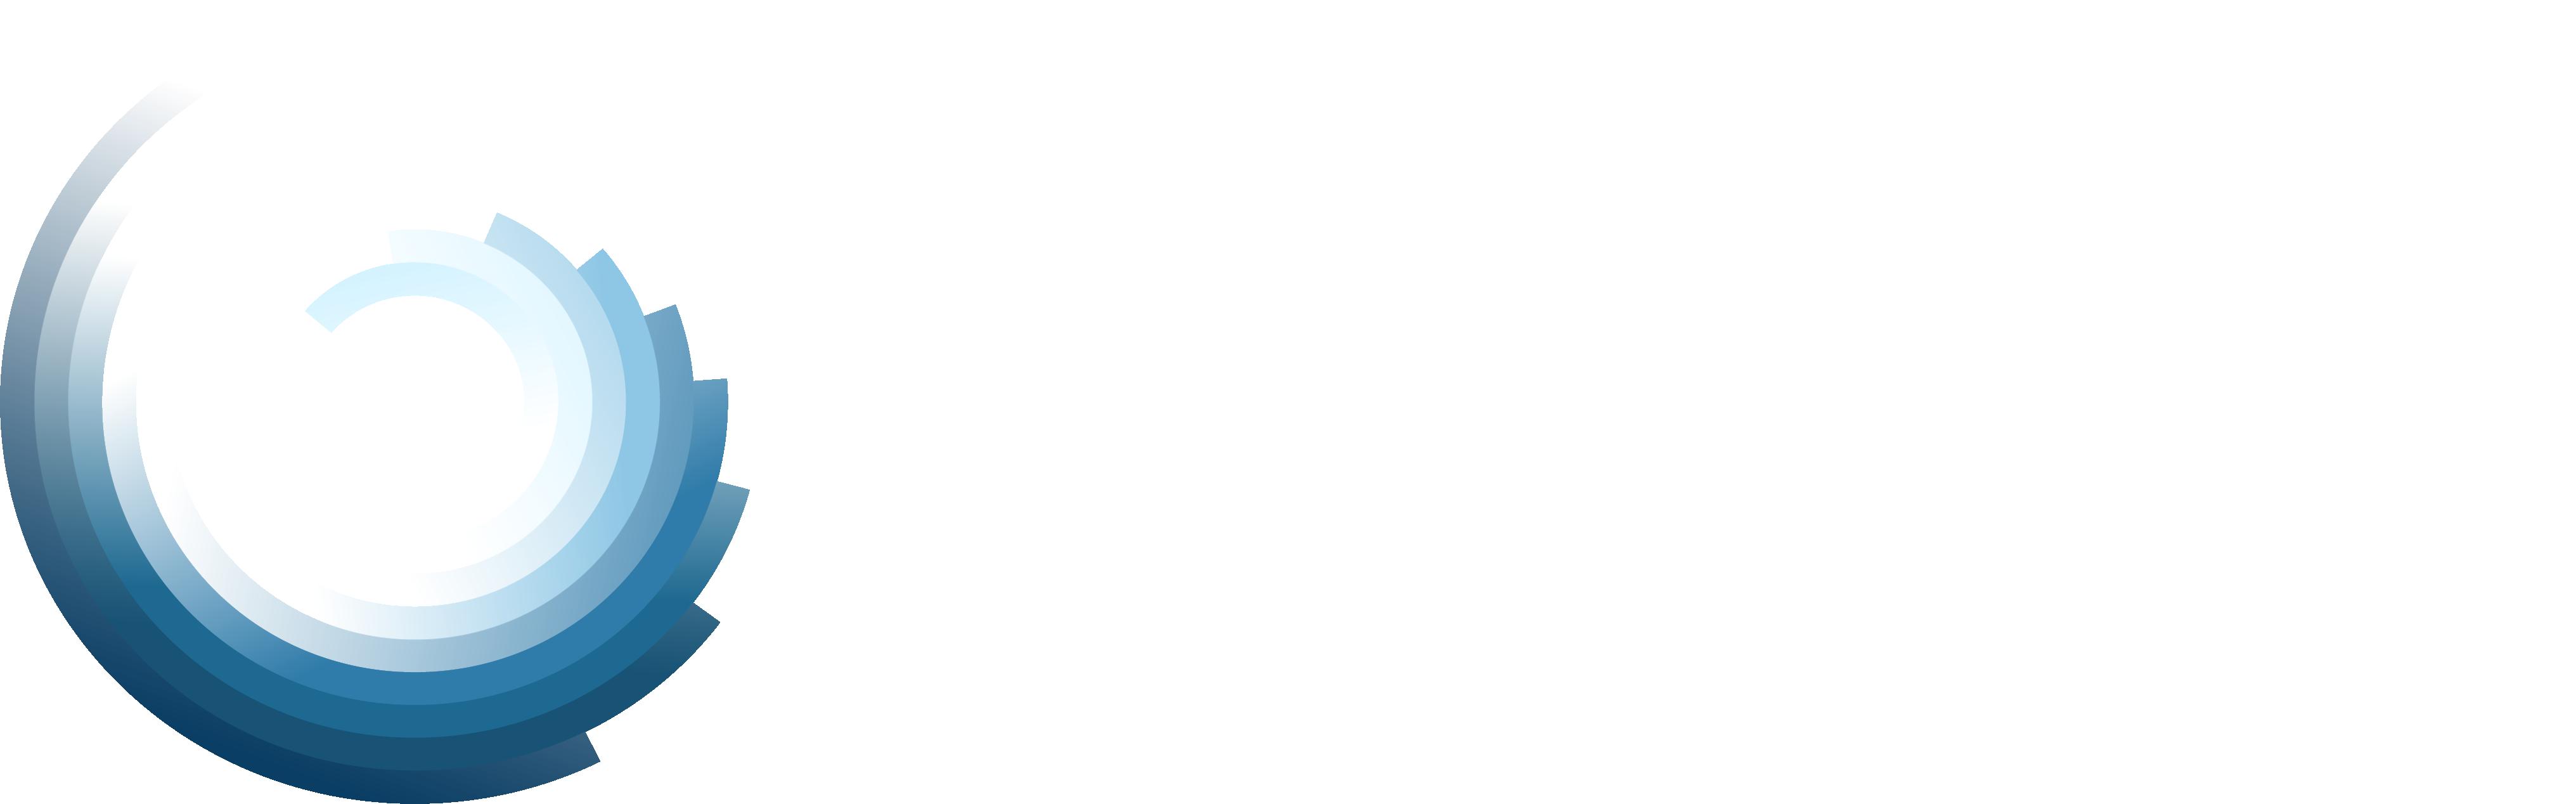 Logo Vortex. белый